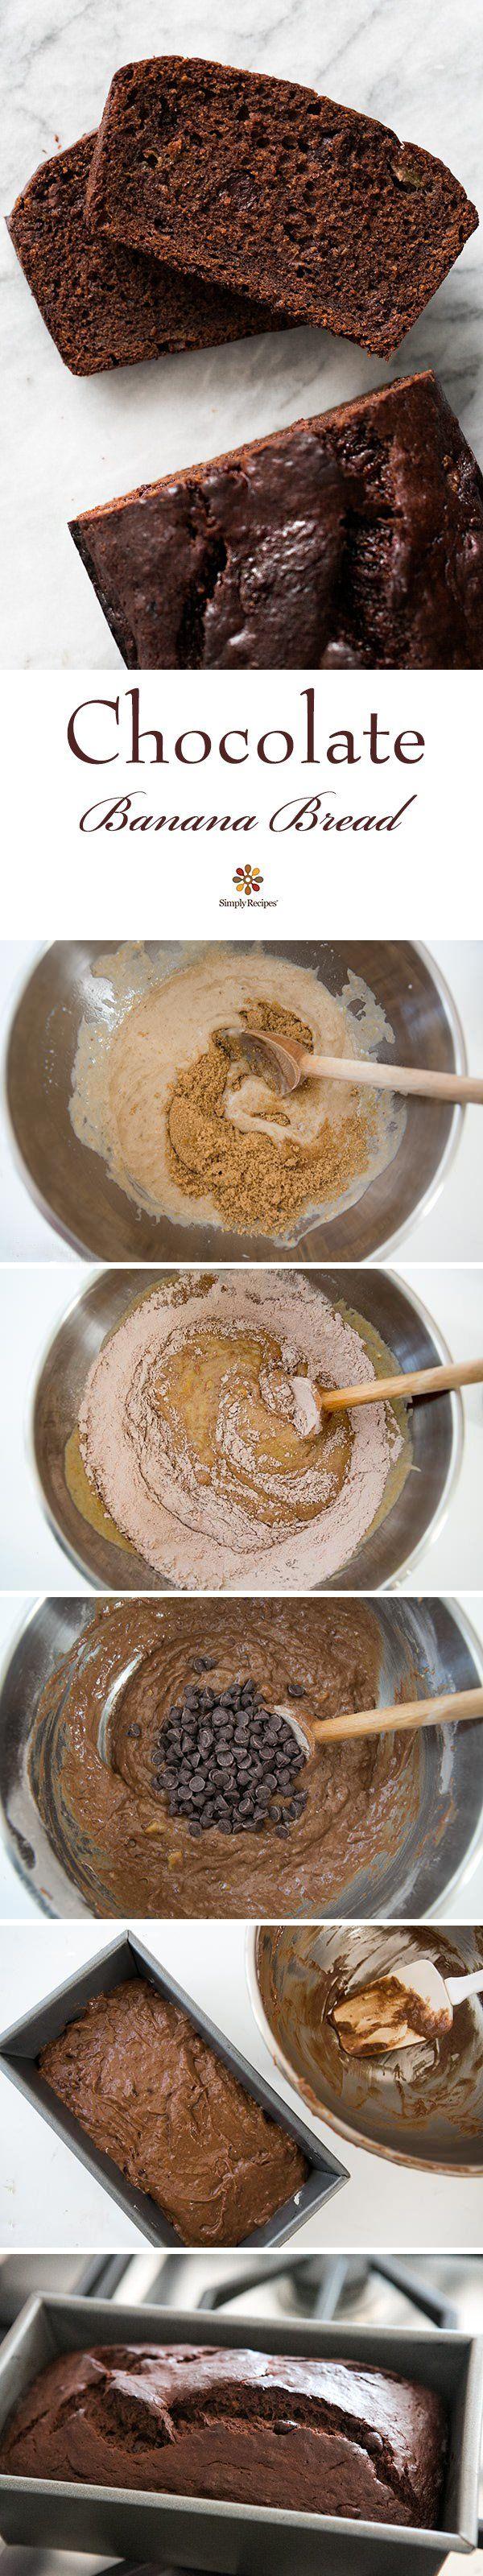 Chocolate Banana Bread ~ Tender, chocolatey chocolate banana bread! Double chocolate with cocoa and chocolate chips. ~ SimplyRecipes.com